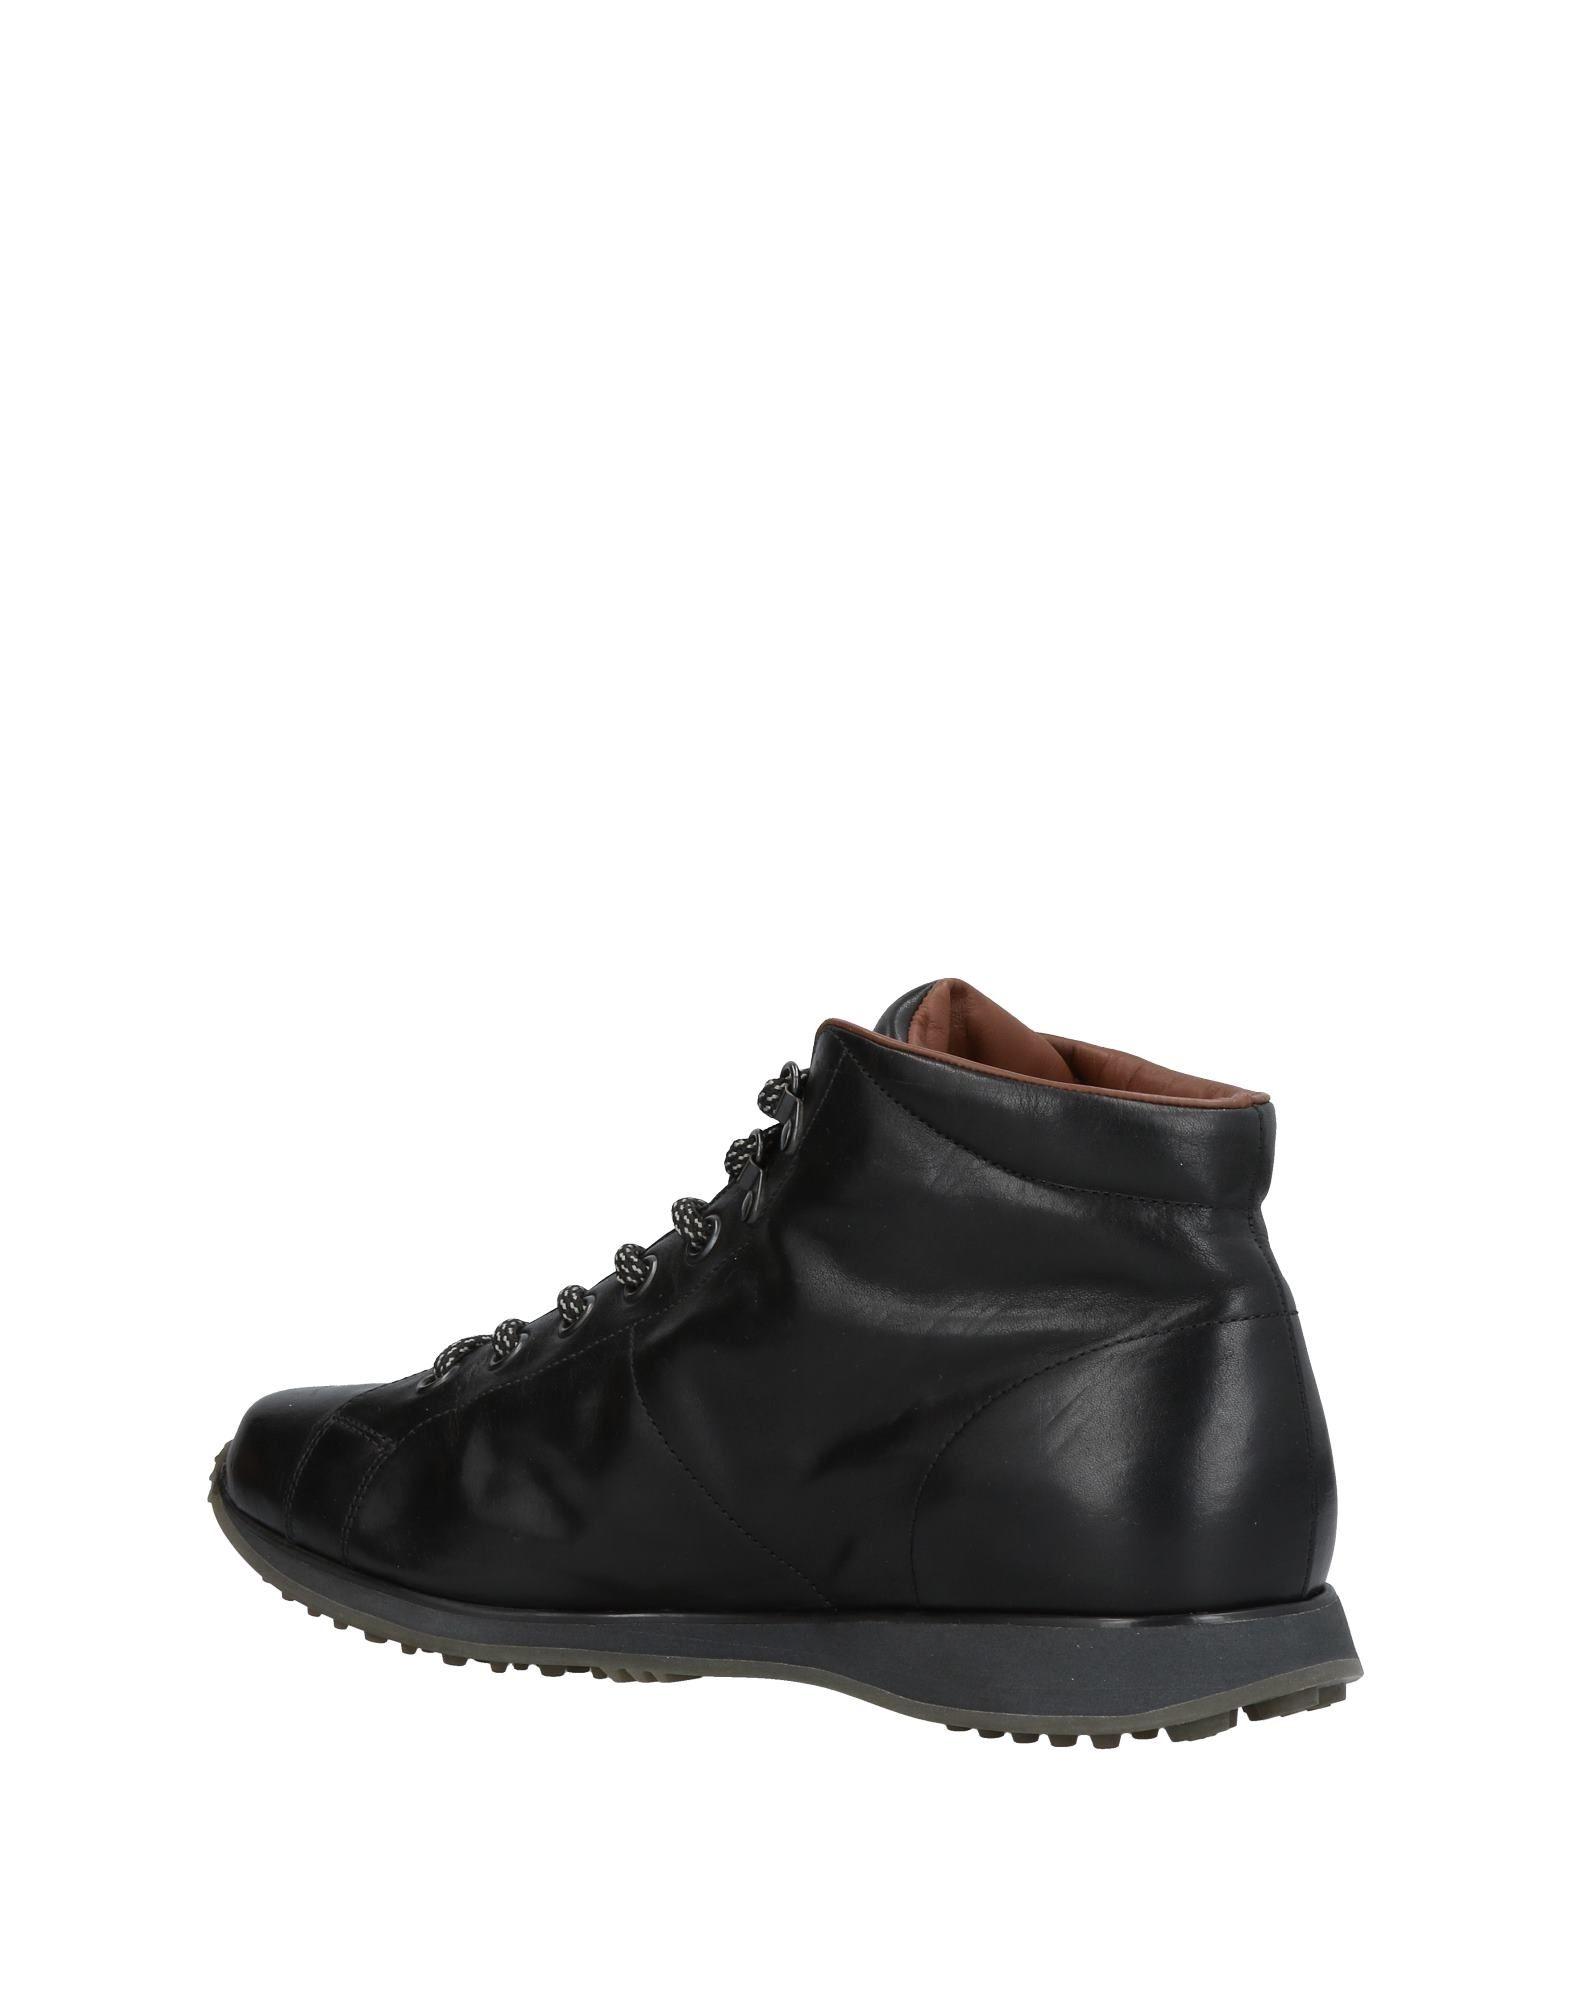 A buon mercato Sneakers Carshoe Uomo - 11439531QO